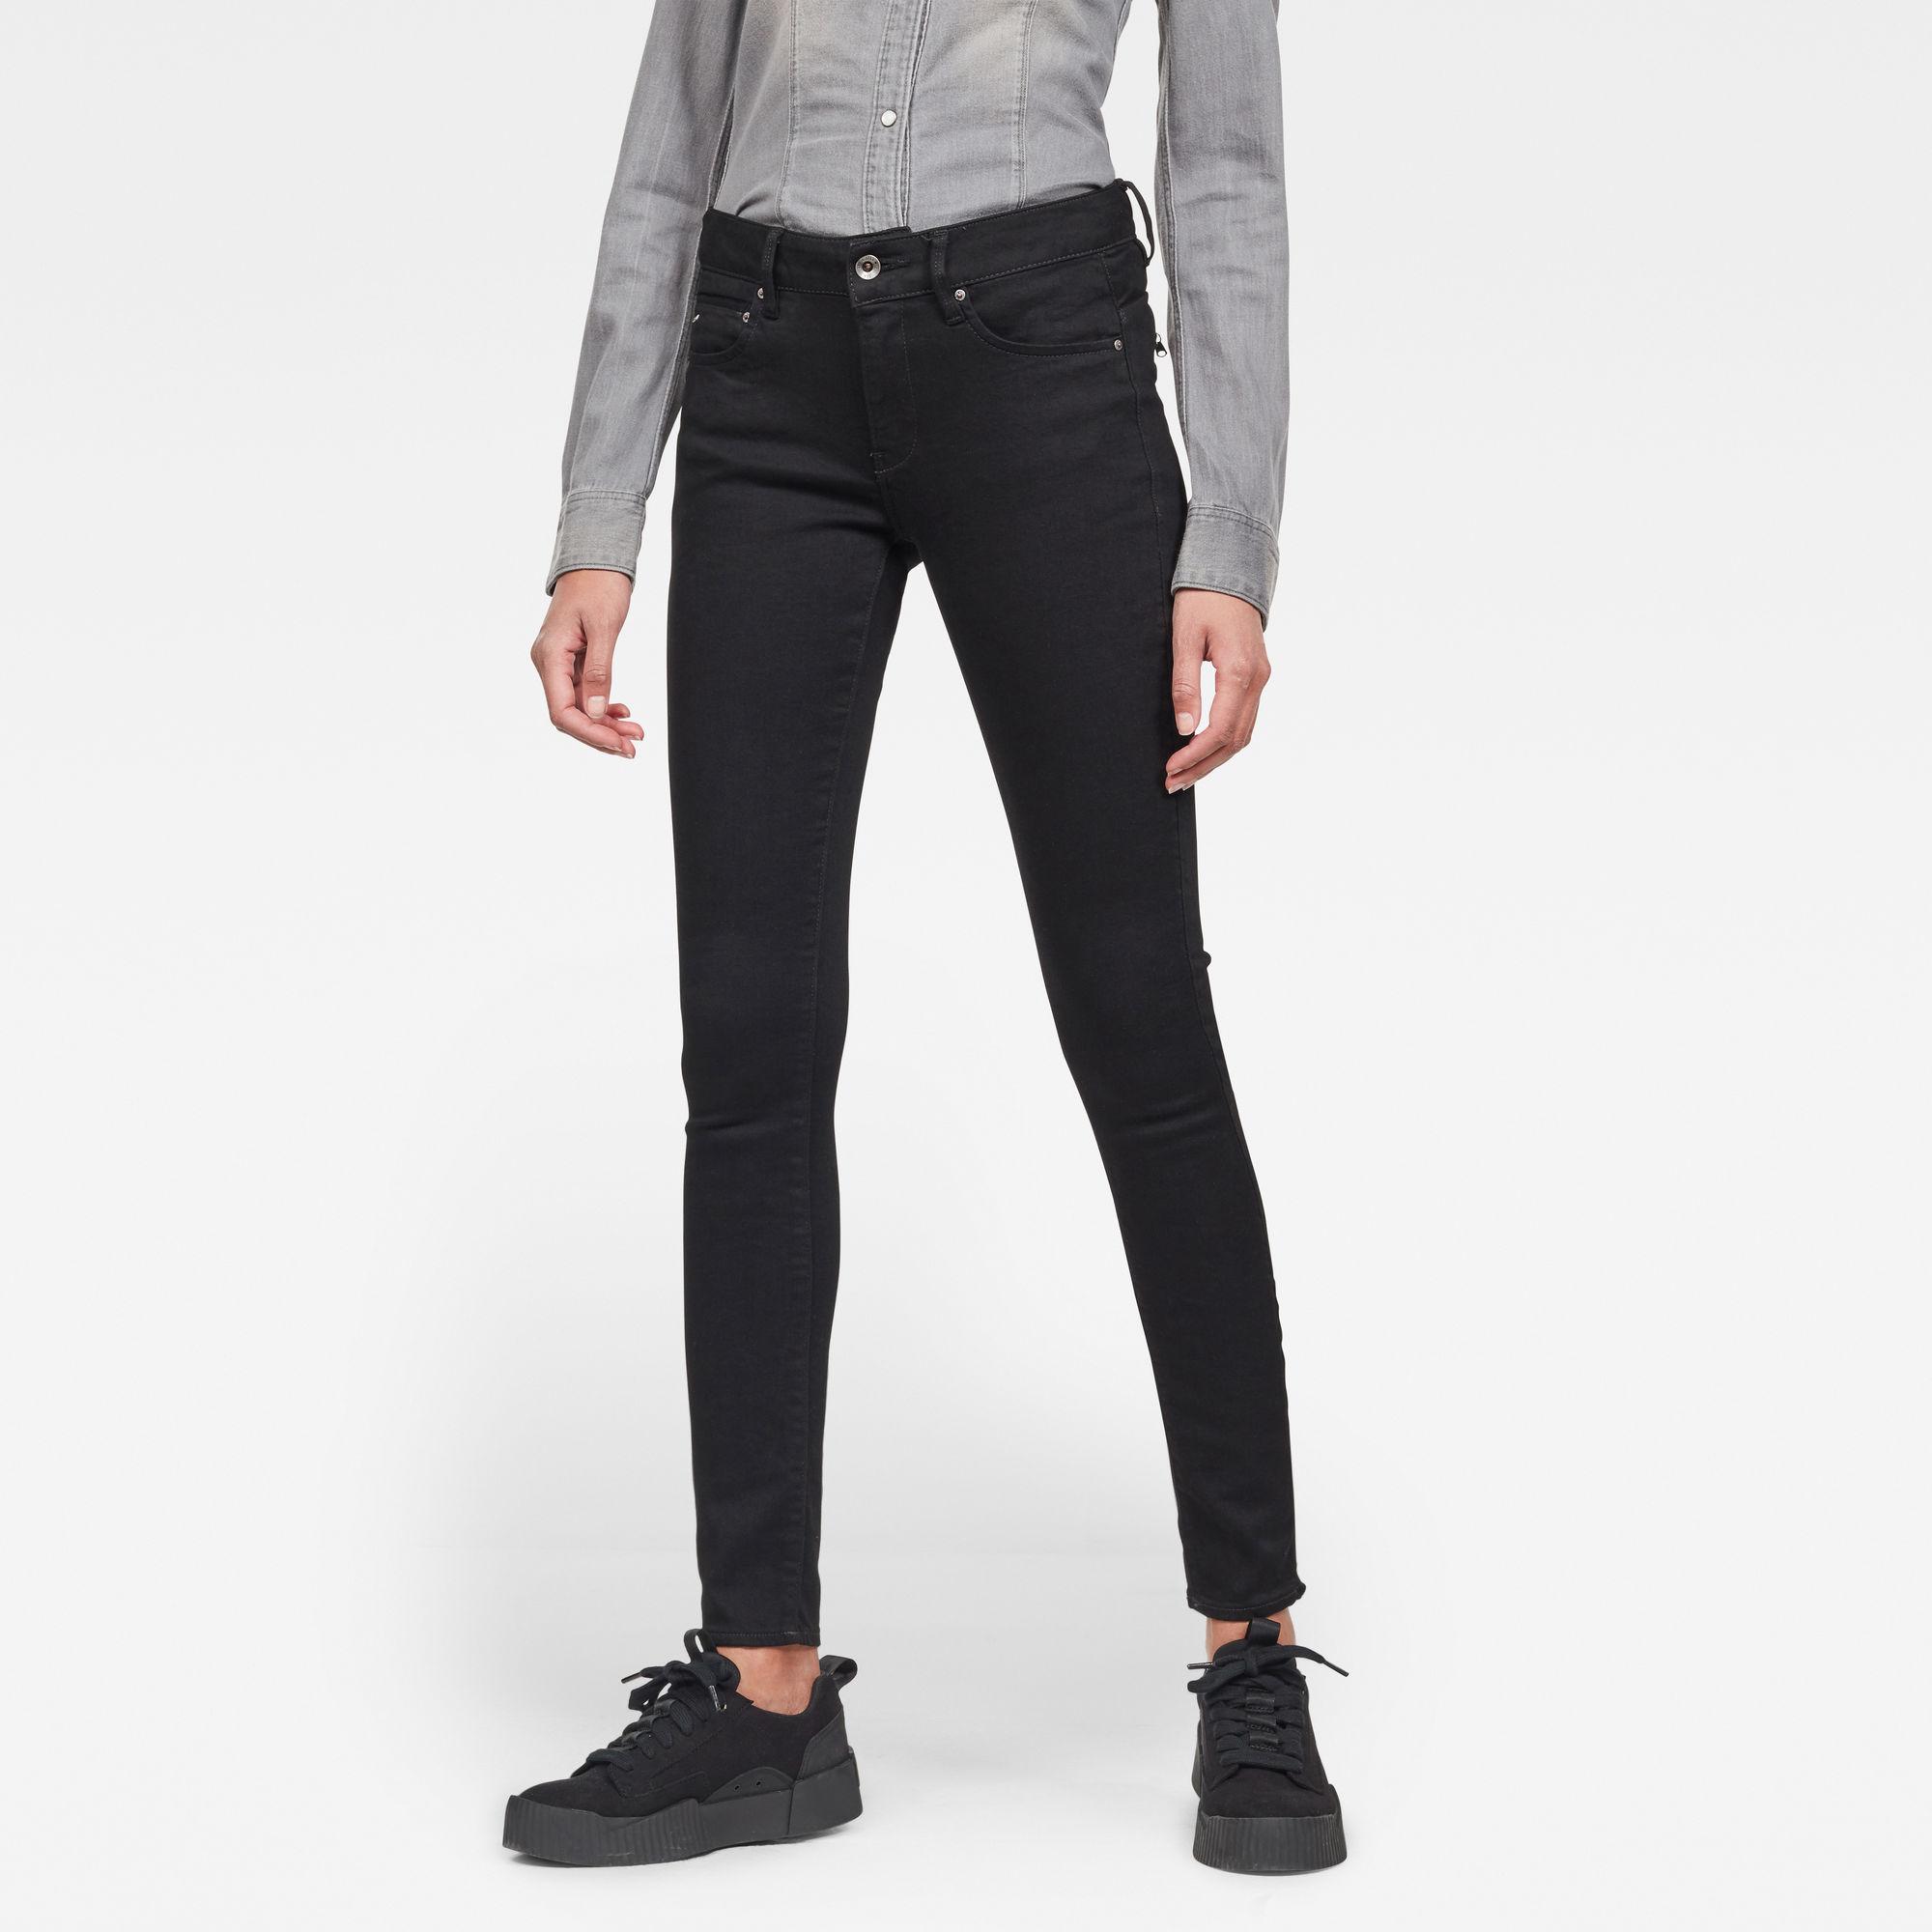 G-Star RAW Hombre Midge Zip Mid SkinnyJeans Negro